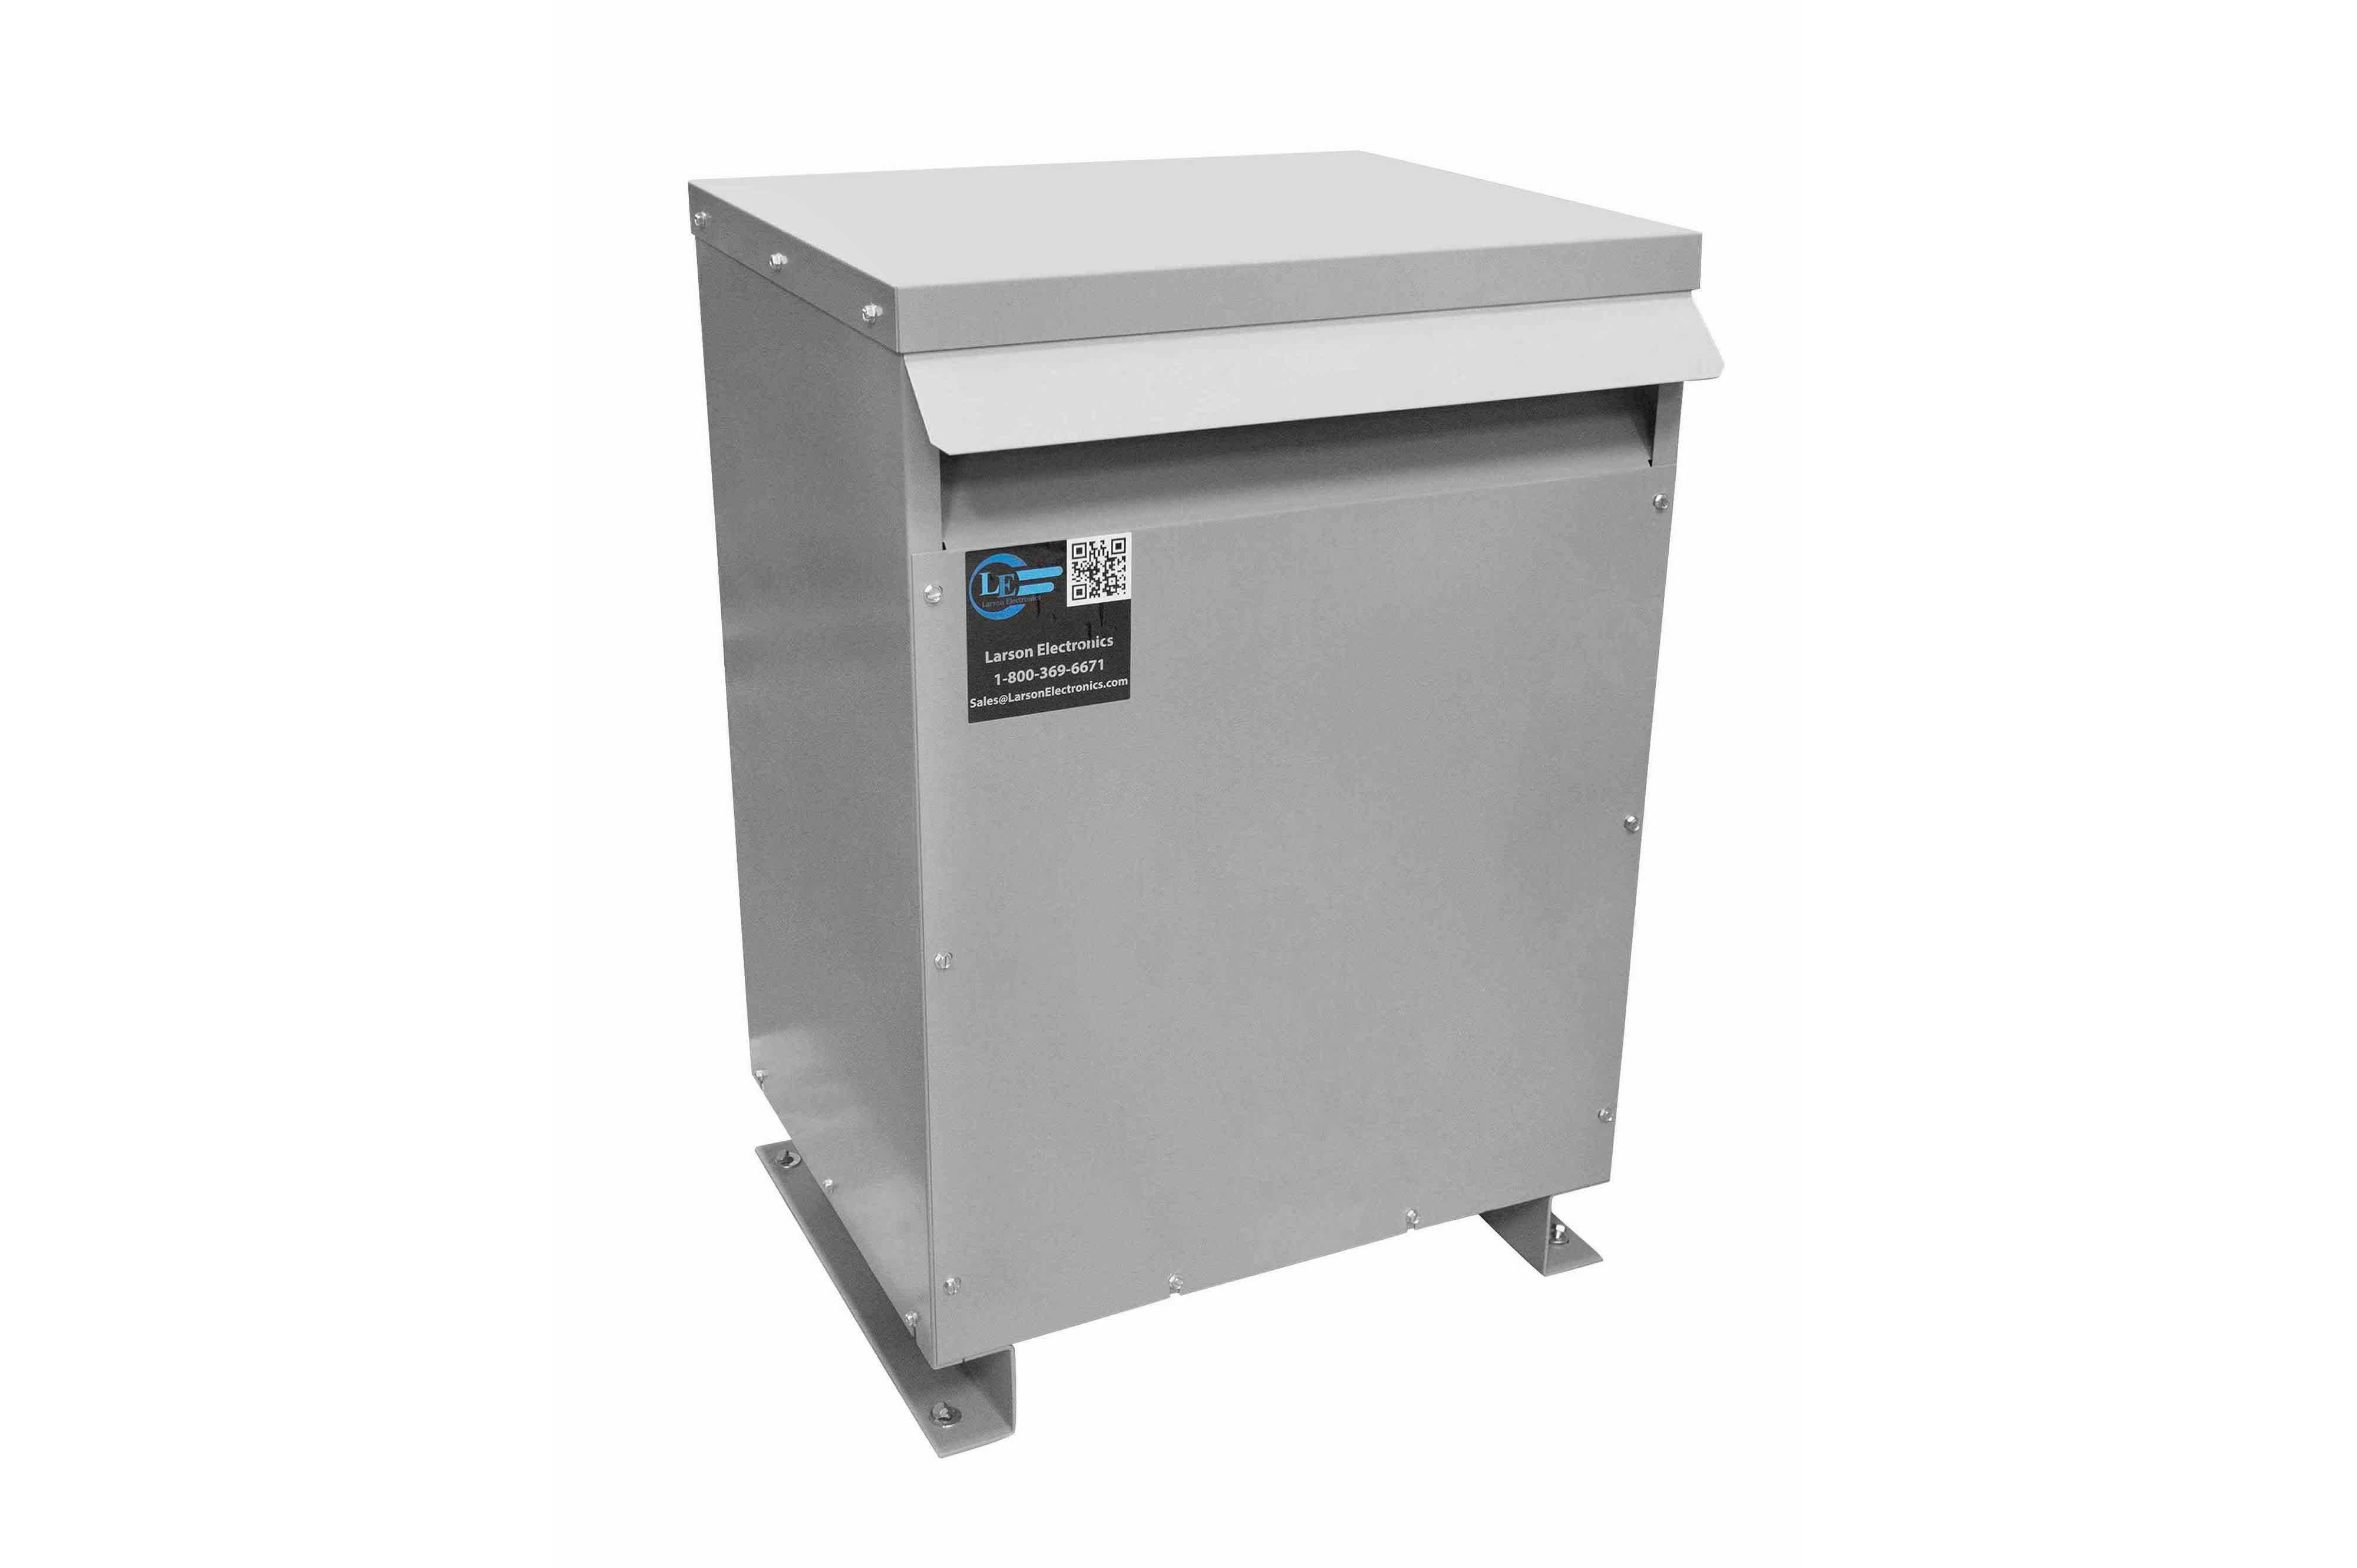 20 kVA 3PH Isolation Transformer, 380V Wye Primary, 480Y/277 Wye-N Secondary, N3R, Ventilated, 60 Hz